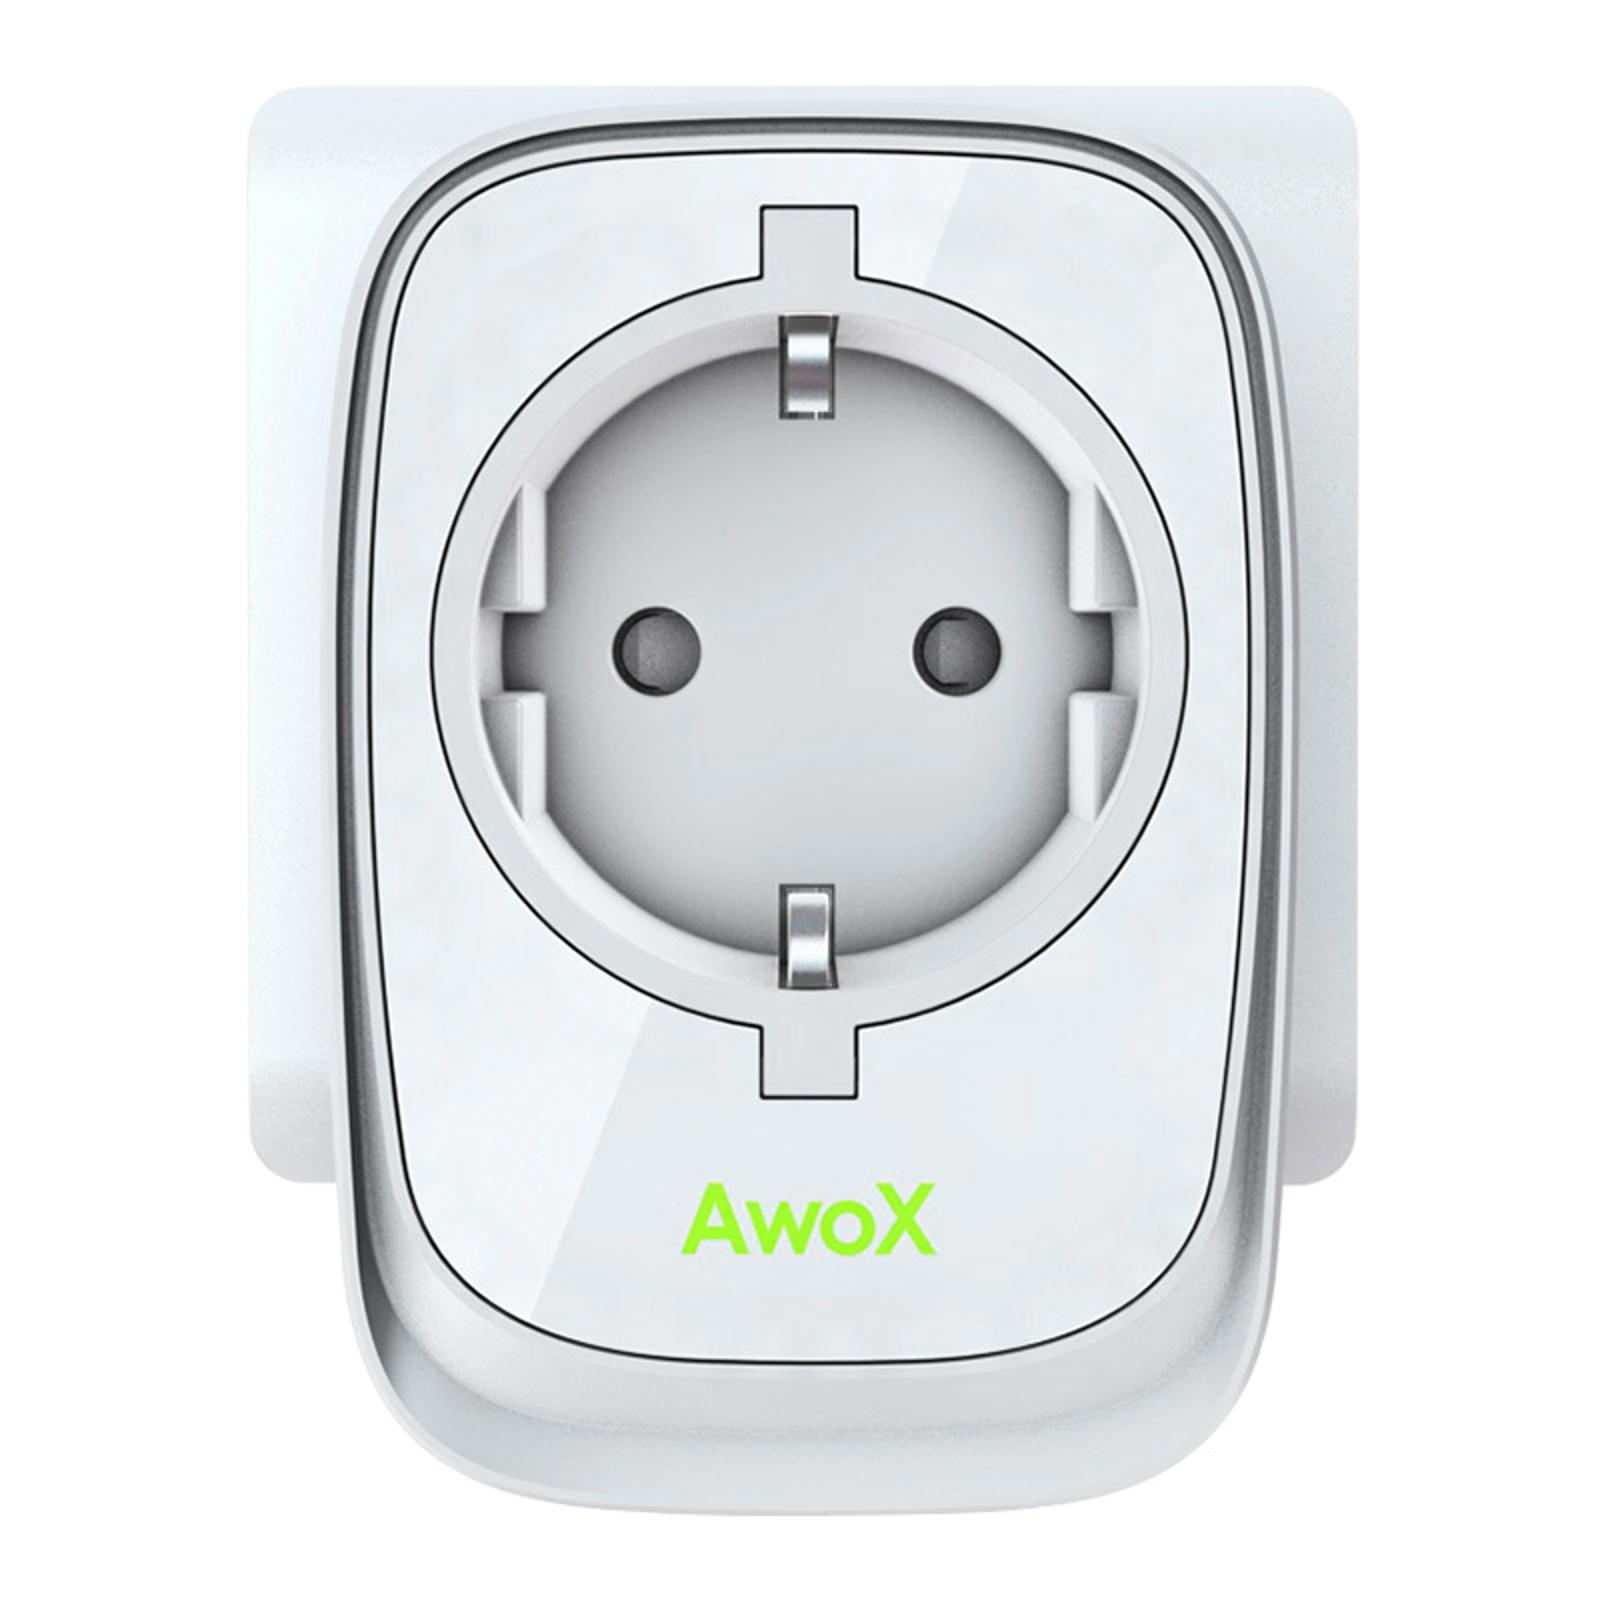 AwoX SmartPLUG Steckdose + Bluetooth-Steuerung